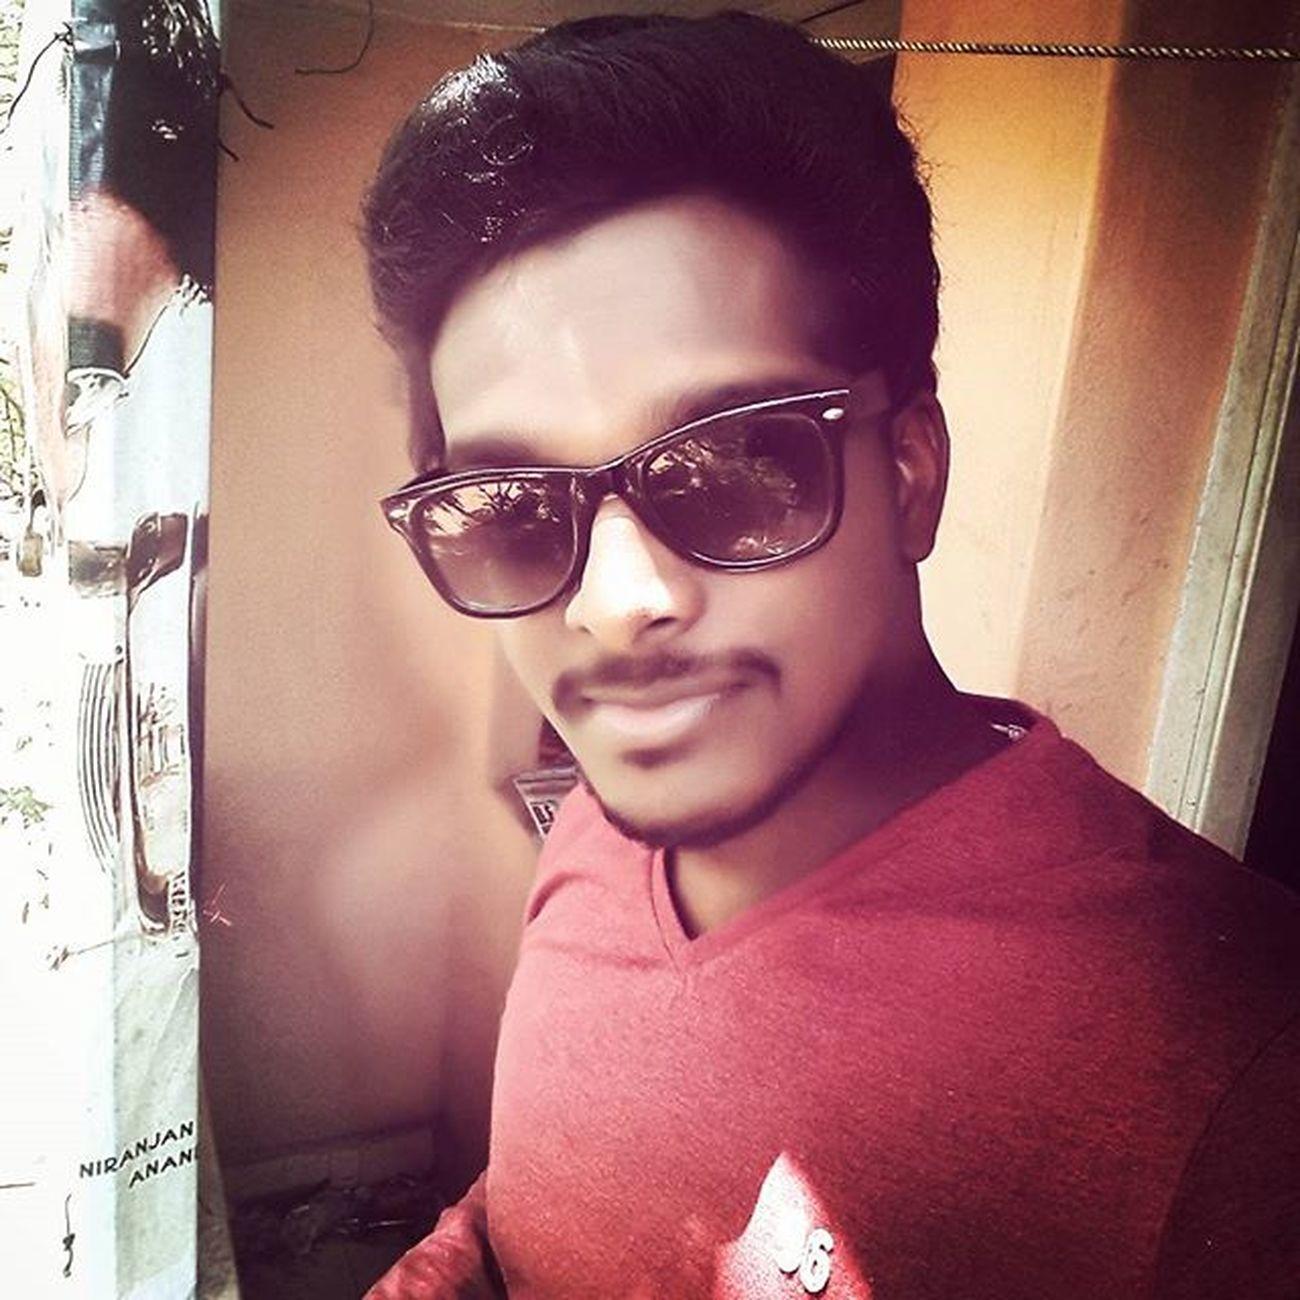 Selfie Cool Casual Sunglass  Lenskart Vincentchase Graphicdesigner Biker Innomad Royalenfield Classic500 Karaikal Chennai Love Monkey